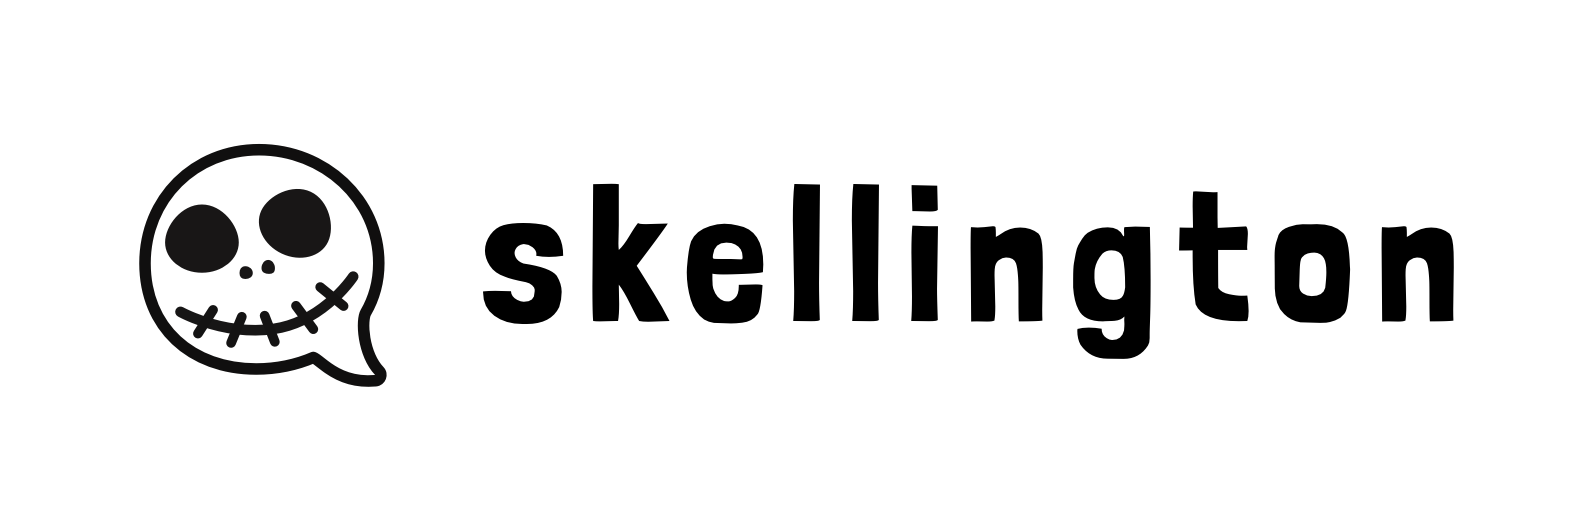 Skellington: the logo is jack the chat bubble, get it???